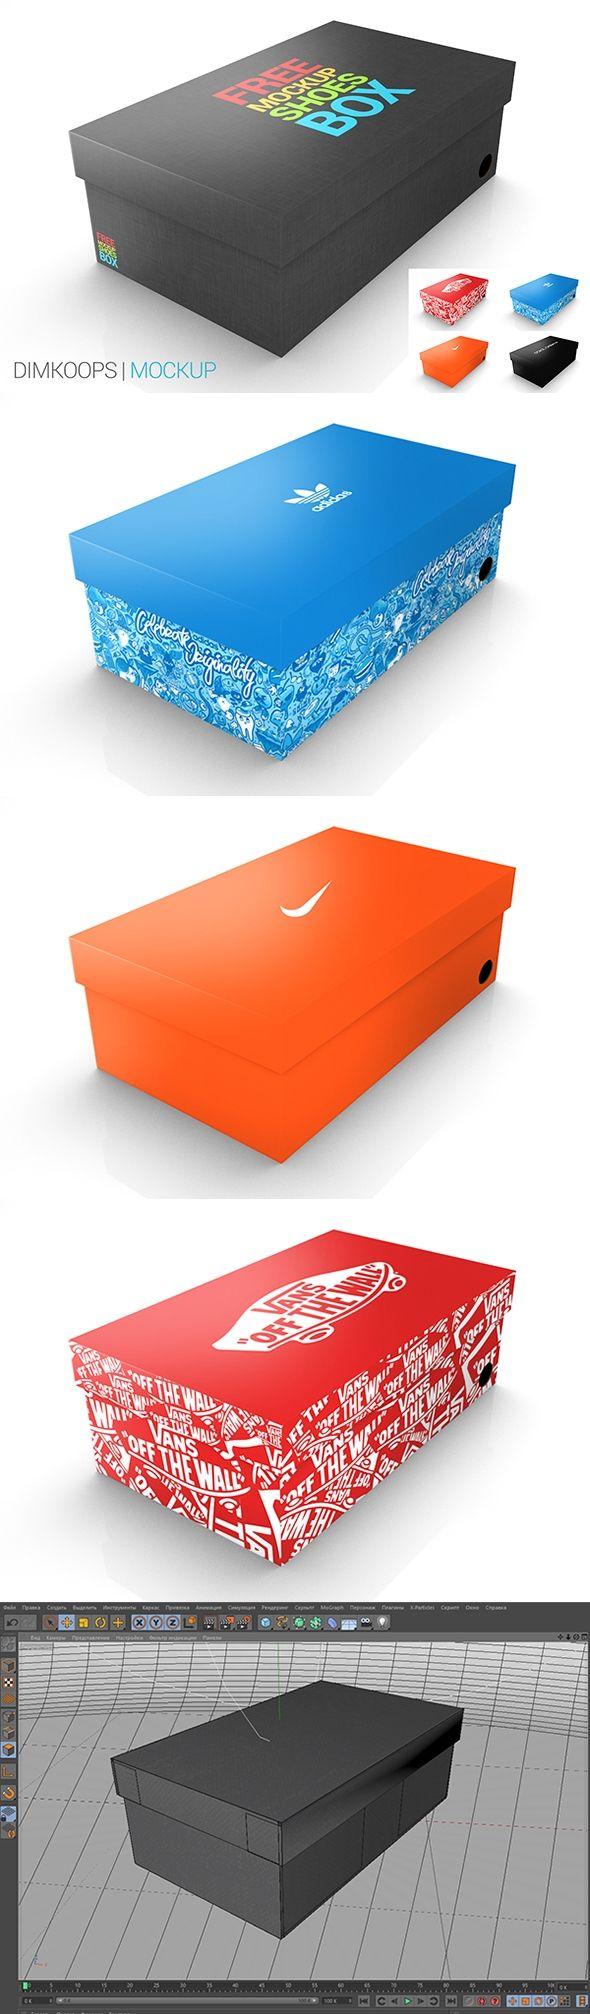 Download Free Mockup Shoes Box Desain Seni